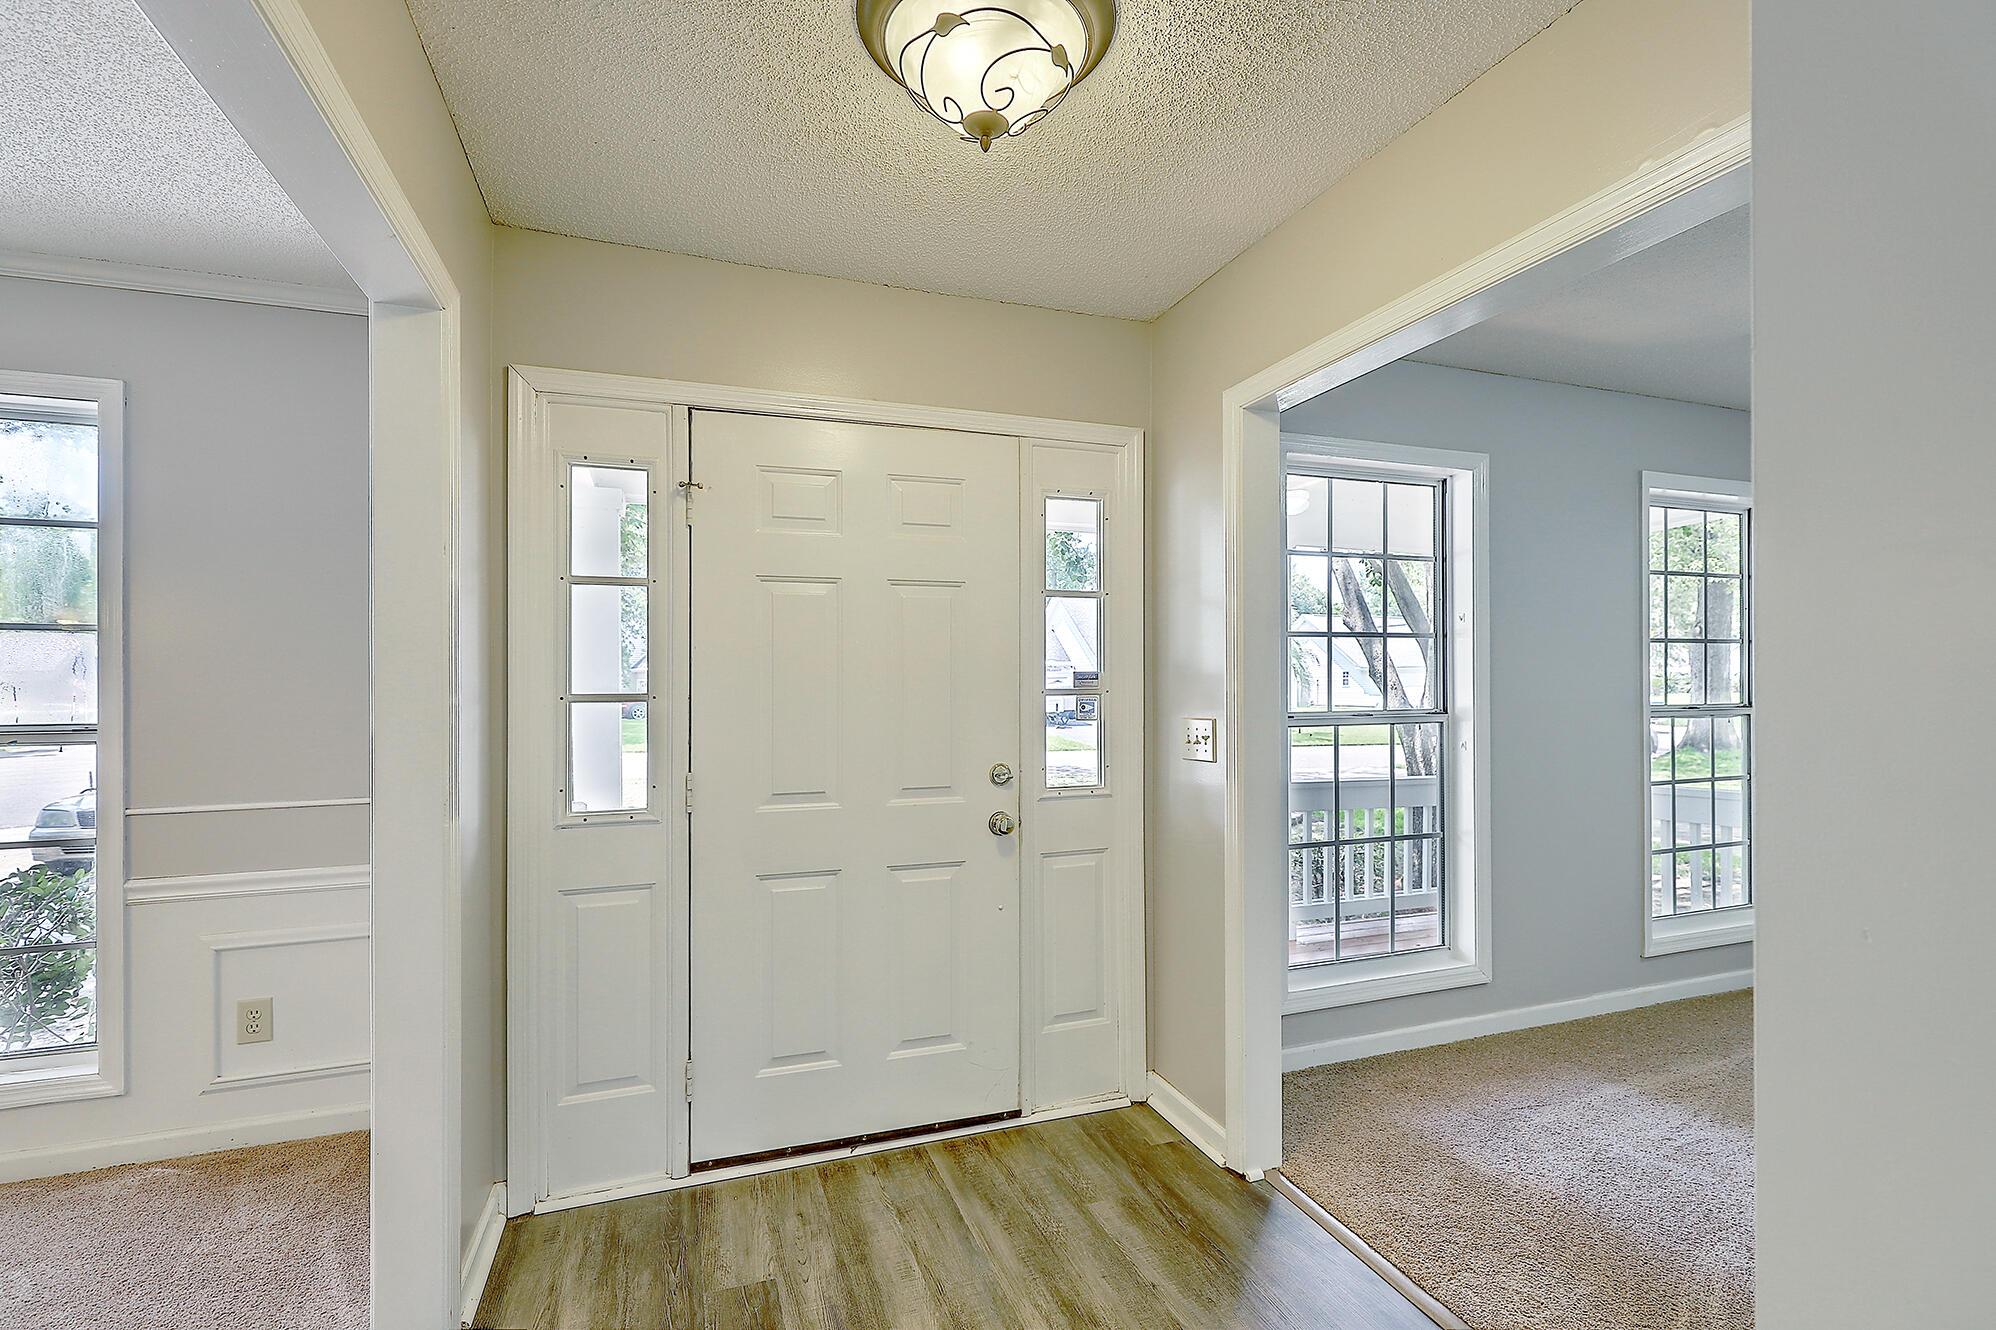 Appian Landing Homes For Sale - 8262 Longridge, North Charleston, SC - 25